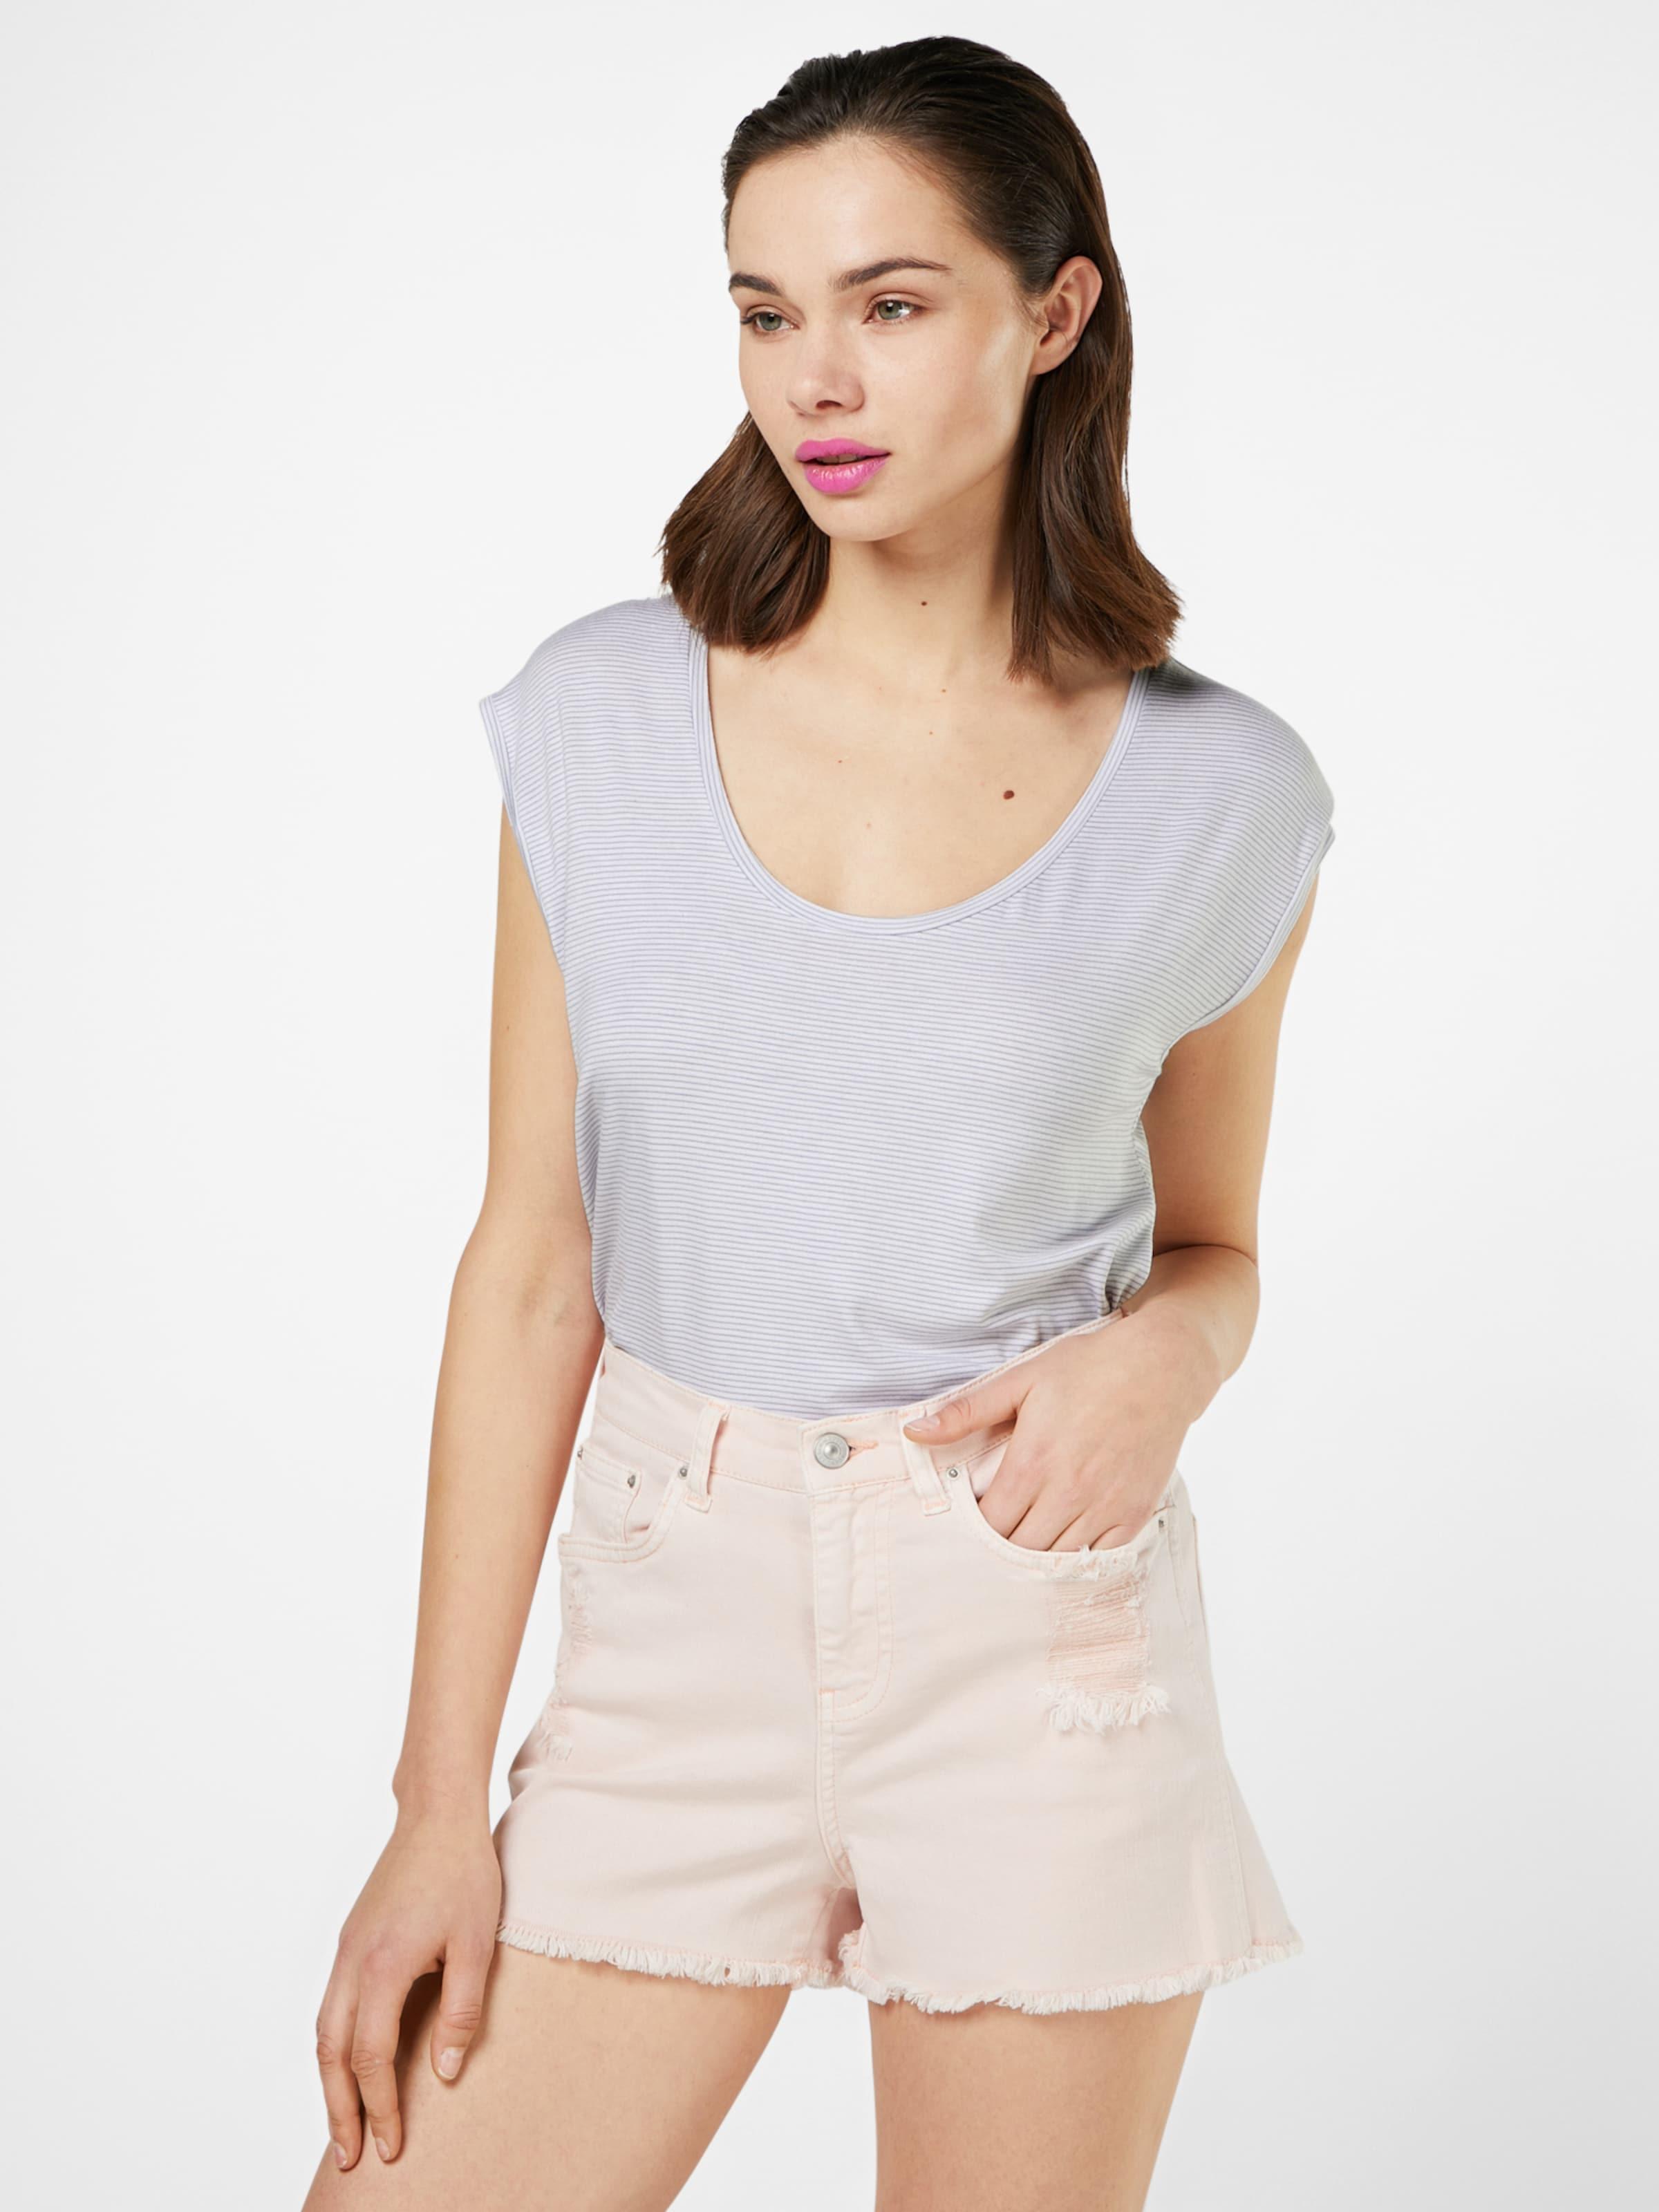 2018 Neue Online Billig Verkauf 100% Original VERO MODA T-Shirt 'LORA' Billig Bester Ort RrZkckATUF